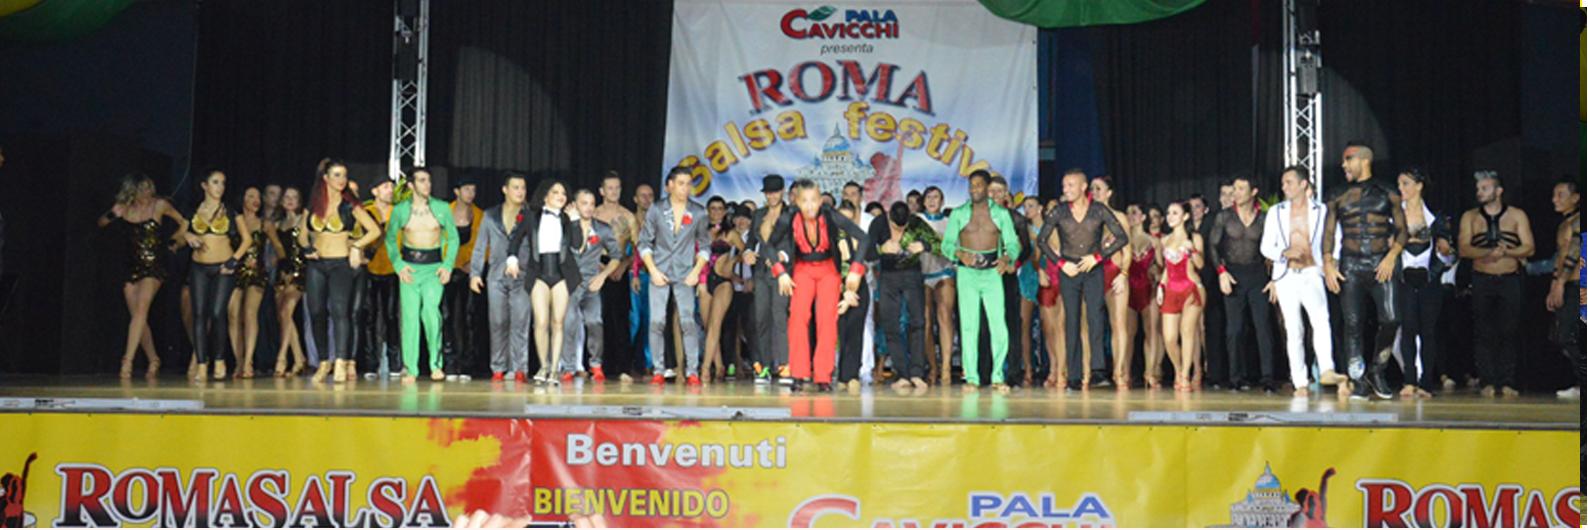 roma-salsa-festival-sito-homepage-PAG-3-2014